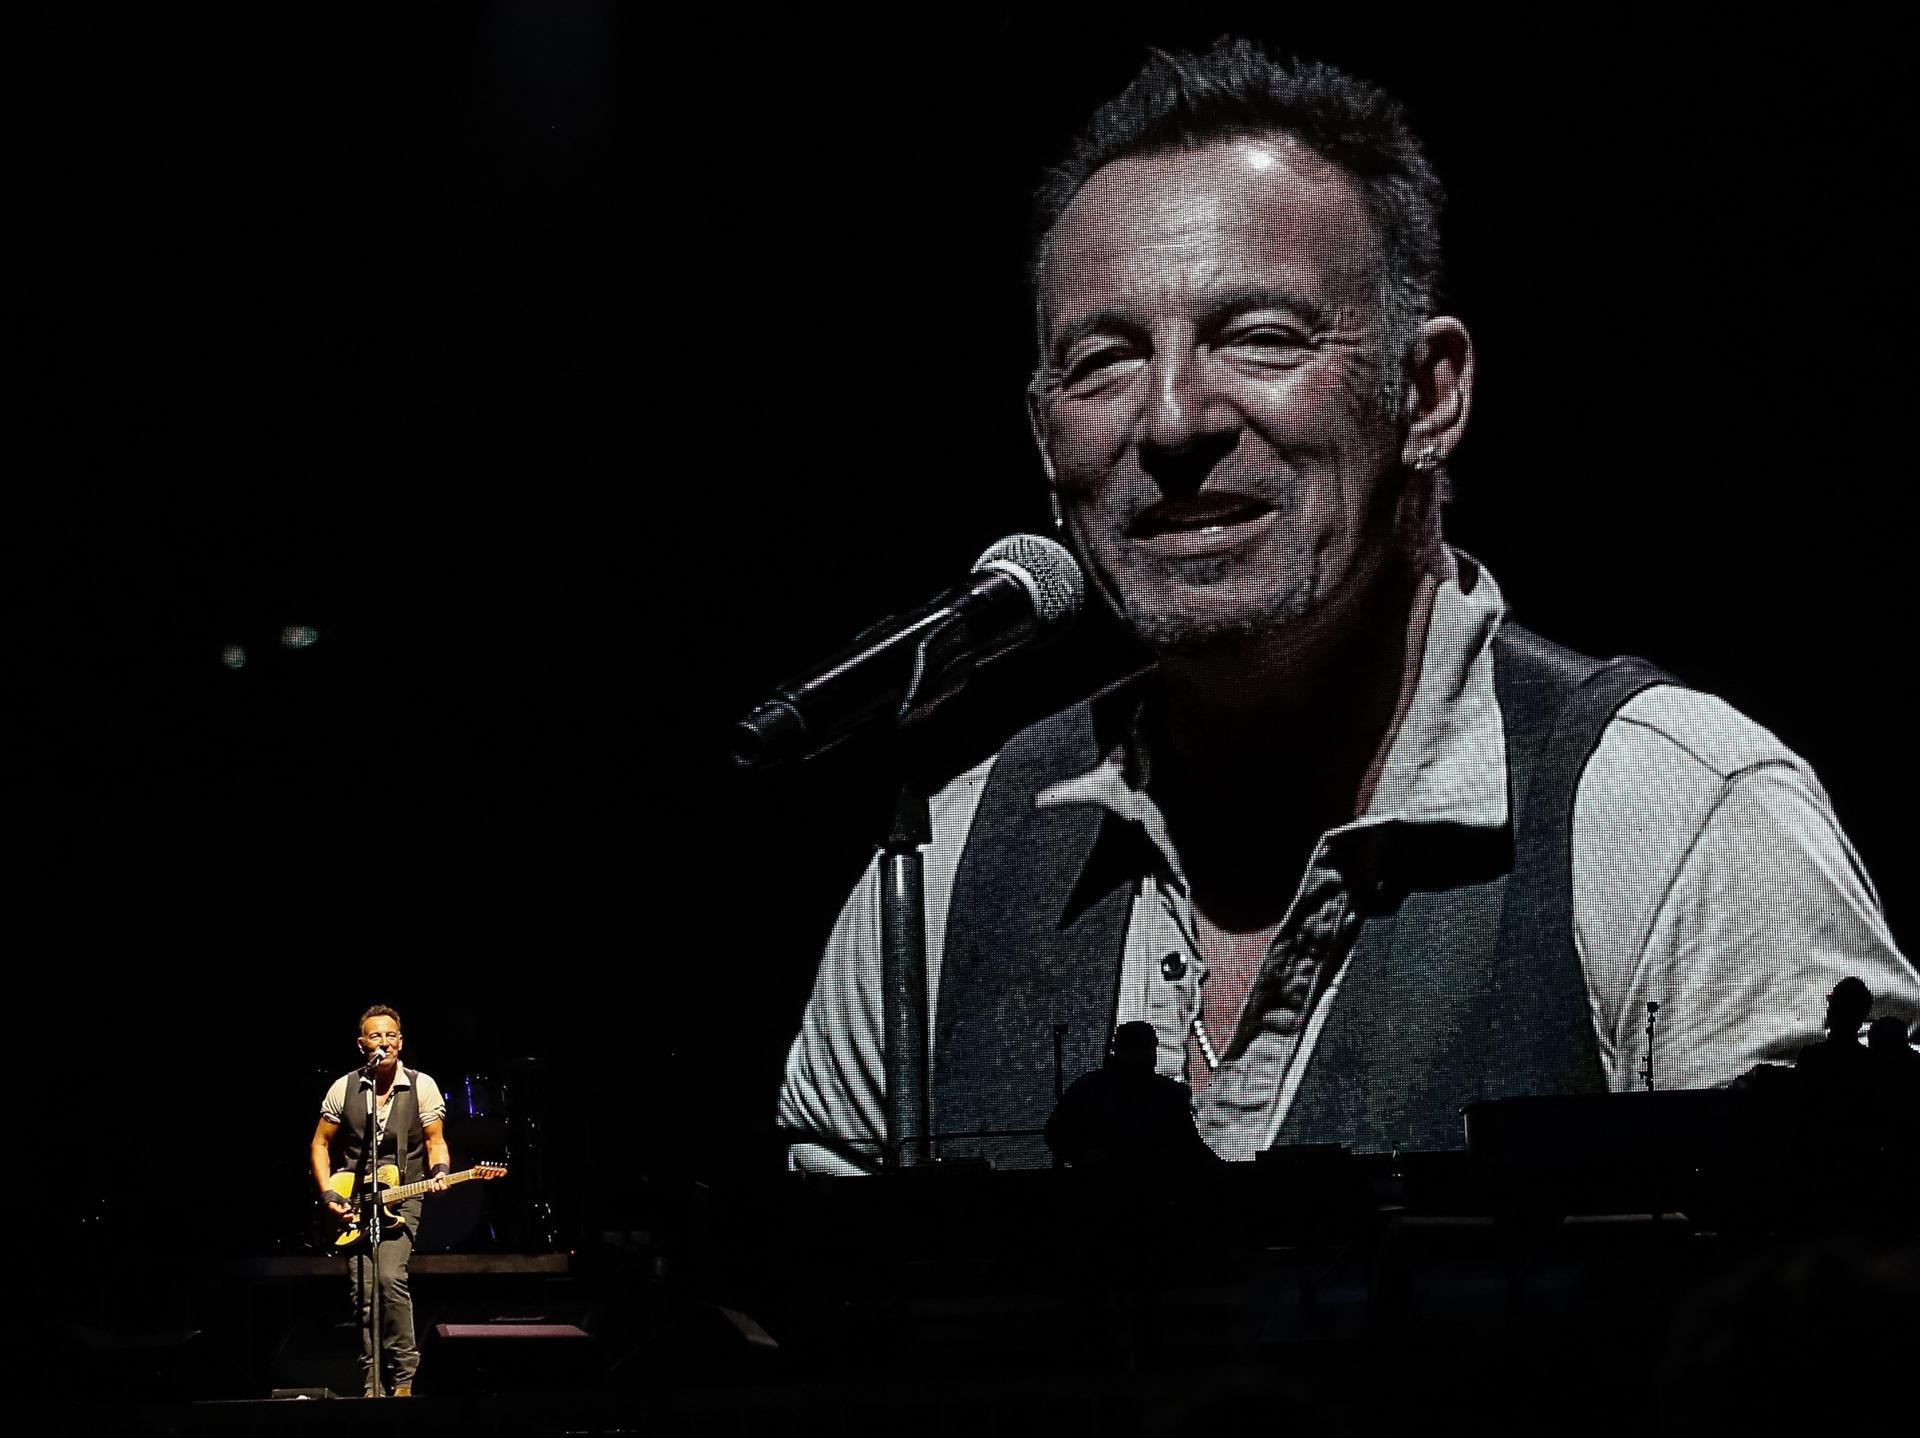 Bruce Springsteen High Definition